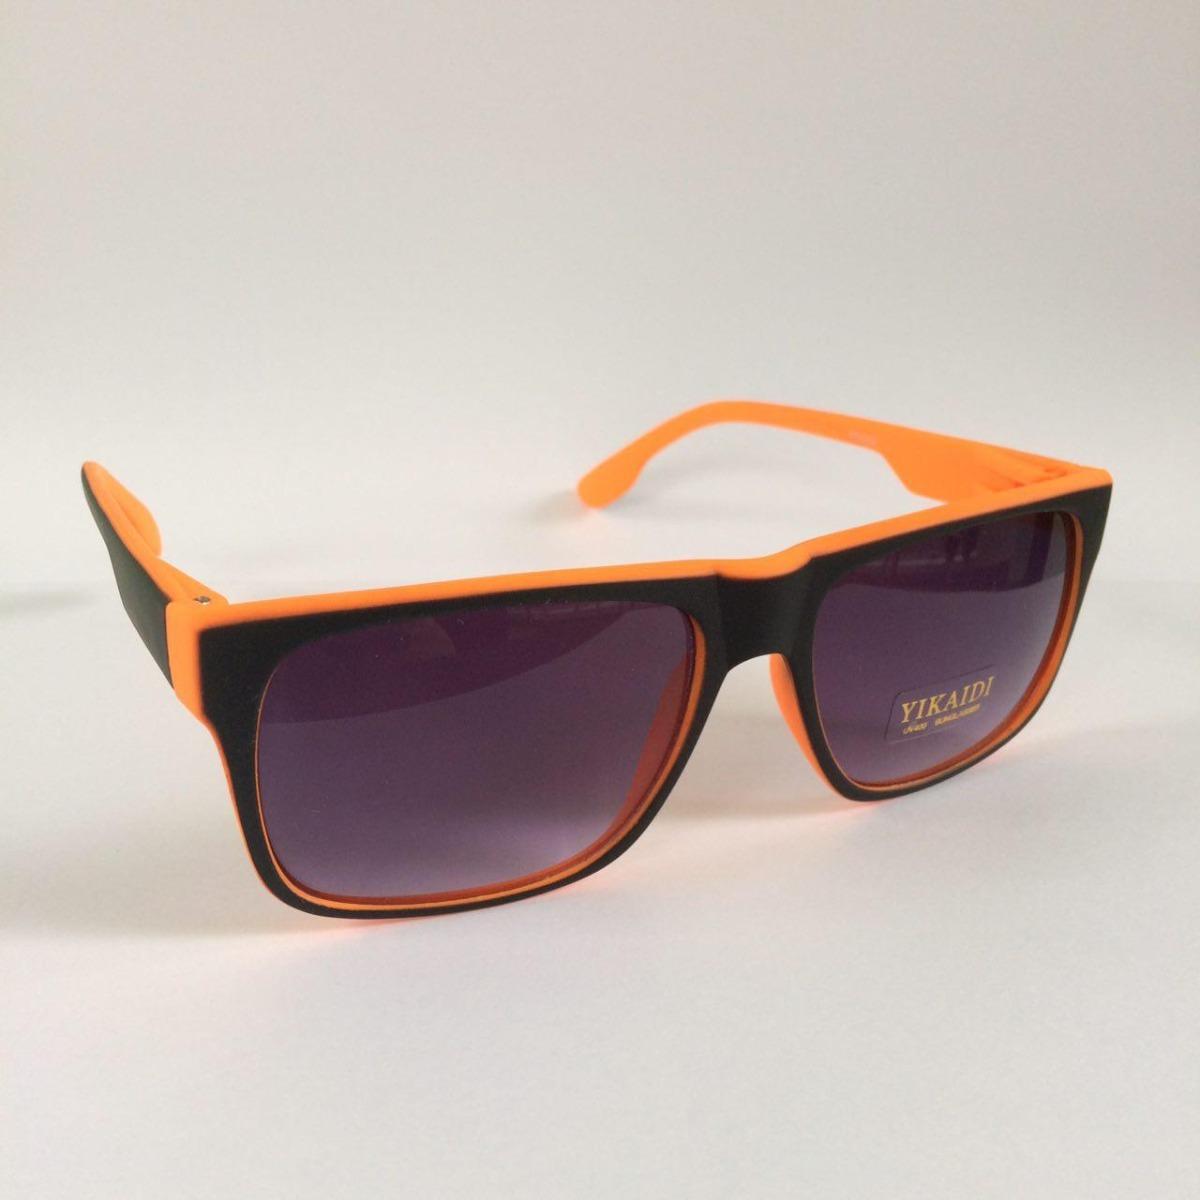 c687bc5f2b439 óculos de sol feminino masculino quadrado preto e laranja. Carregando zoom.